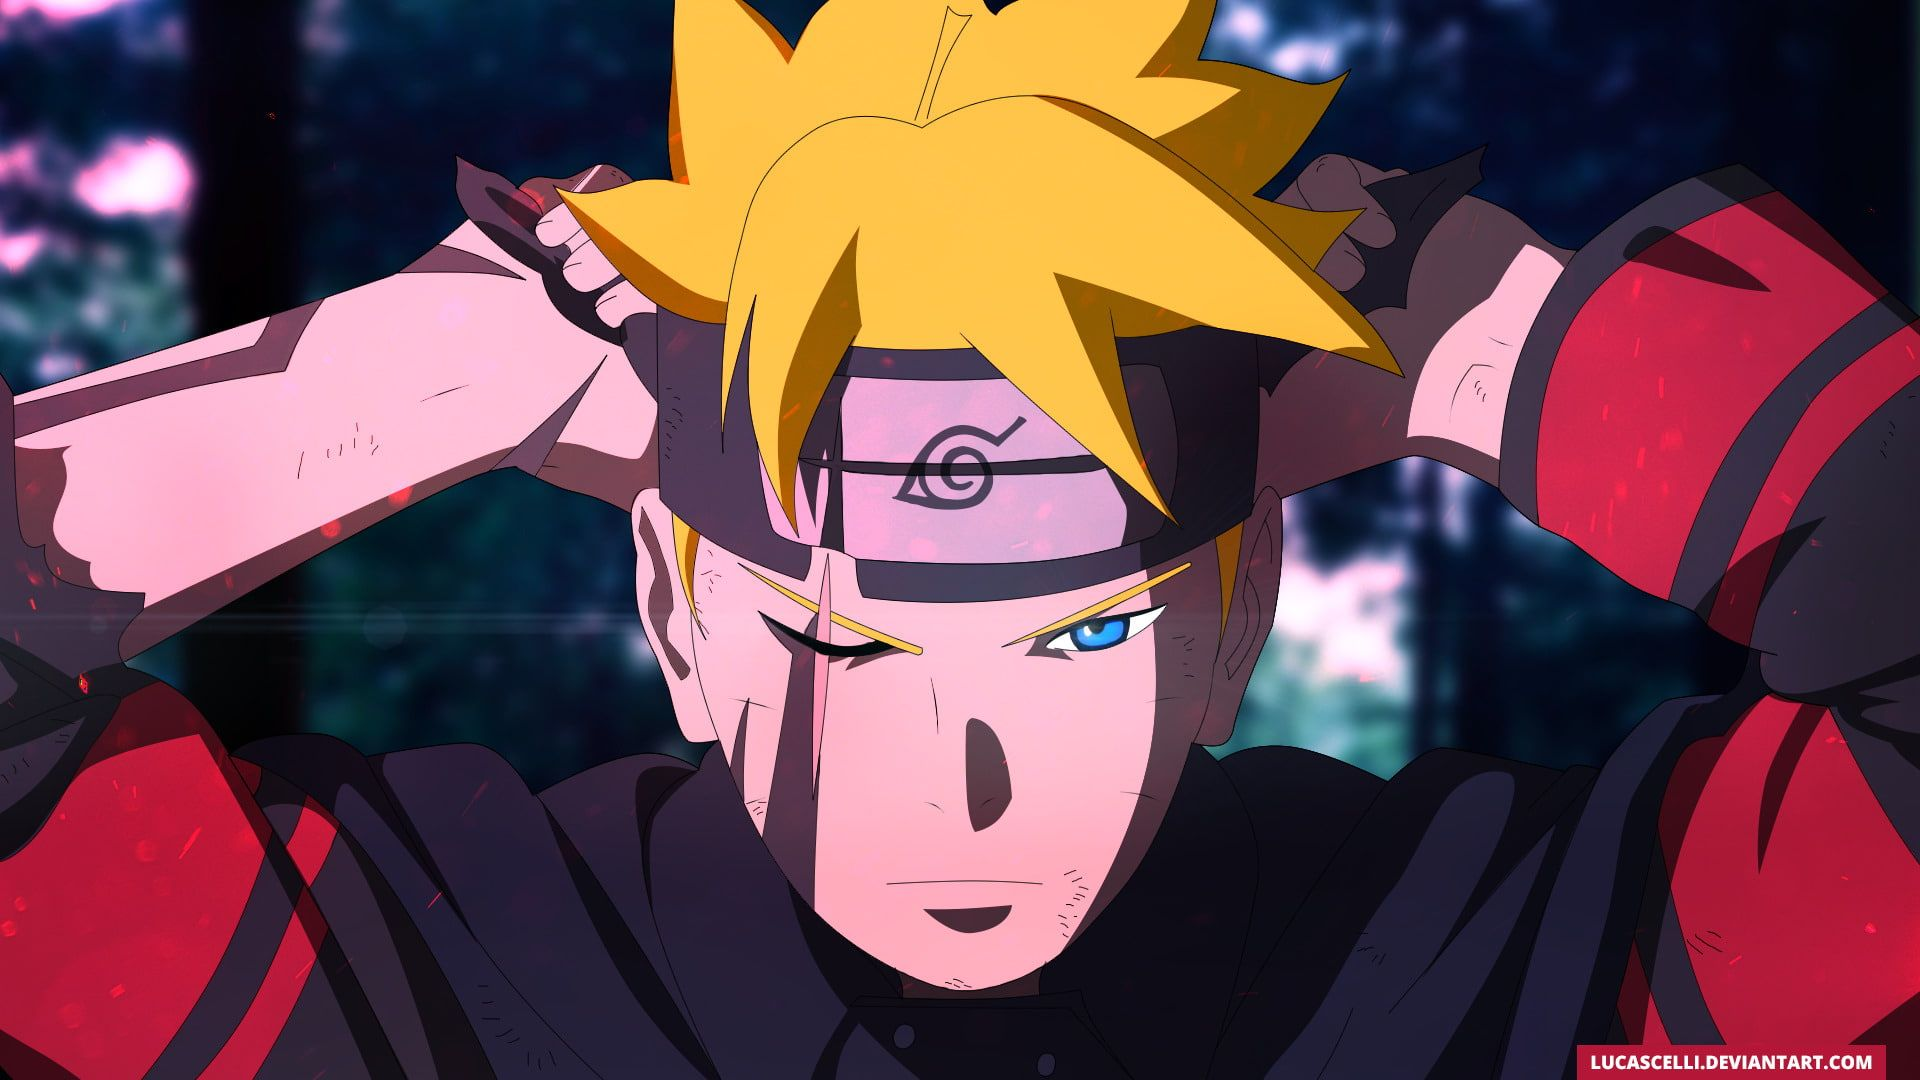 Anime Boruto Boruto Uzumaki 1080p Wallpaper Hdwallpaper Desktop Anime Boruto Naruto Wallpaper Iphone